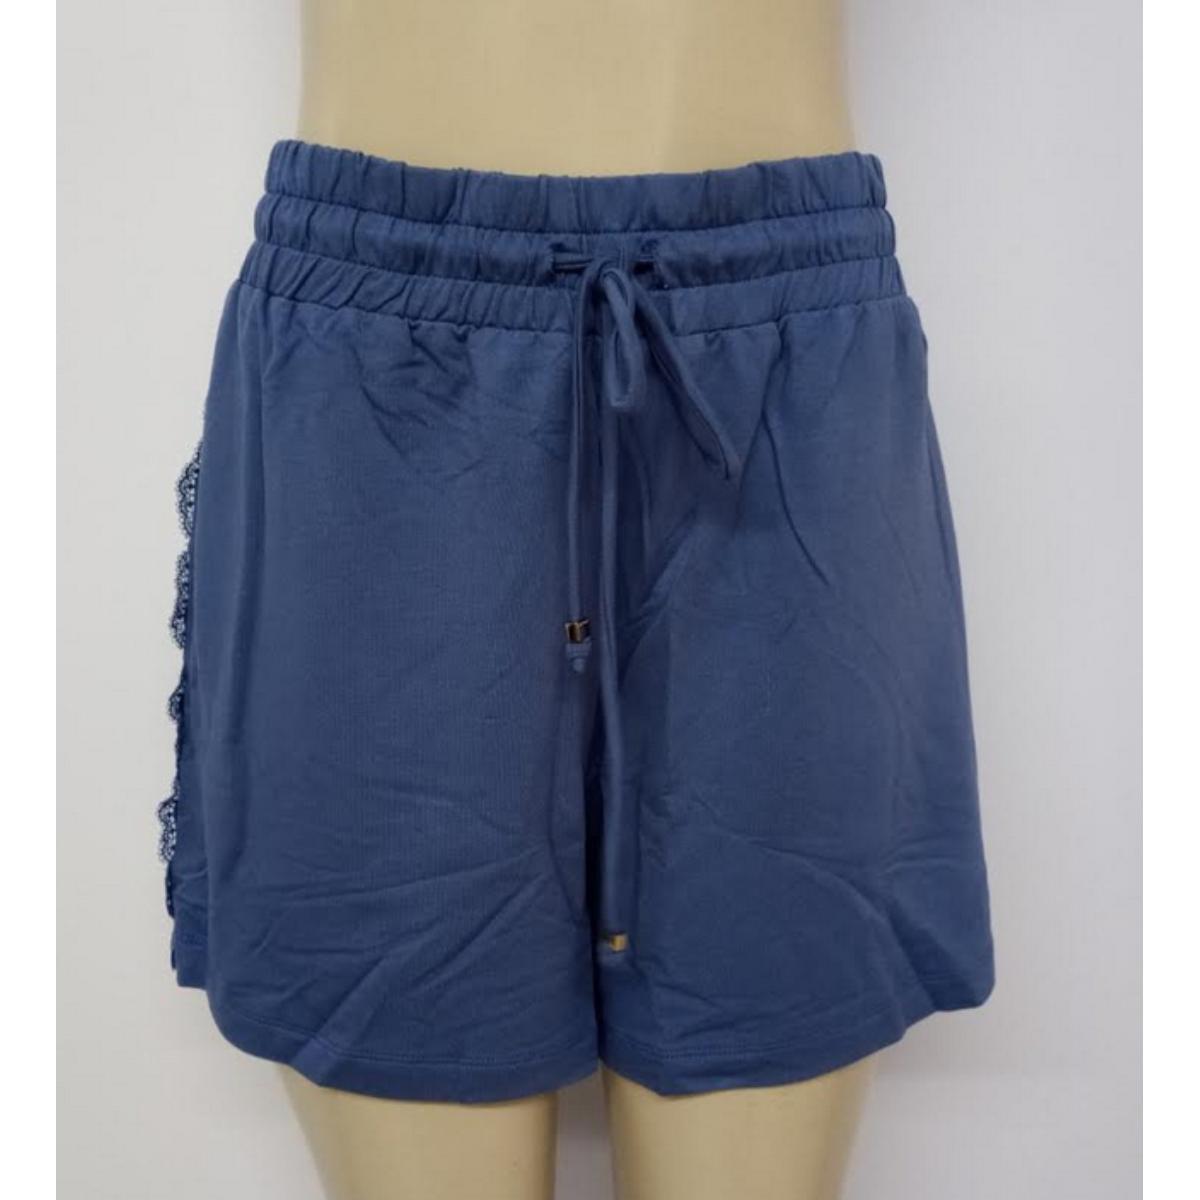 Short Feminino Lado Avesso L114463 Azul Jeans